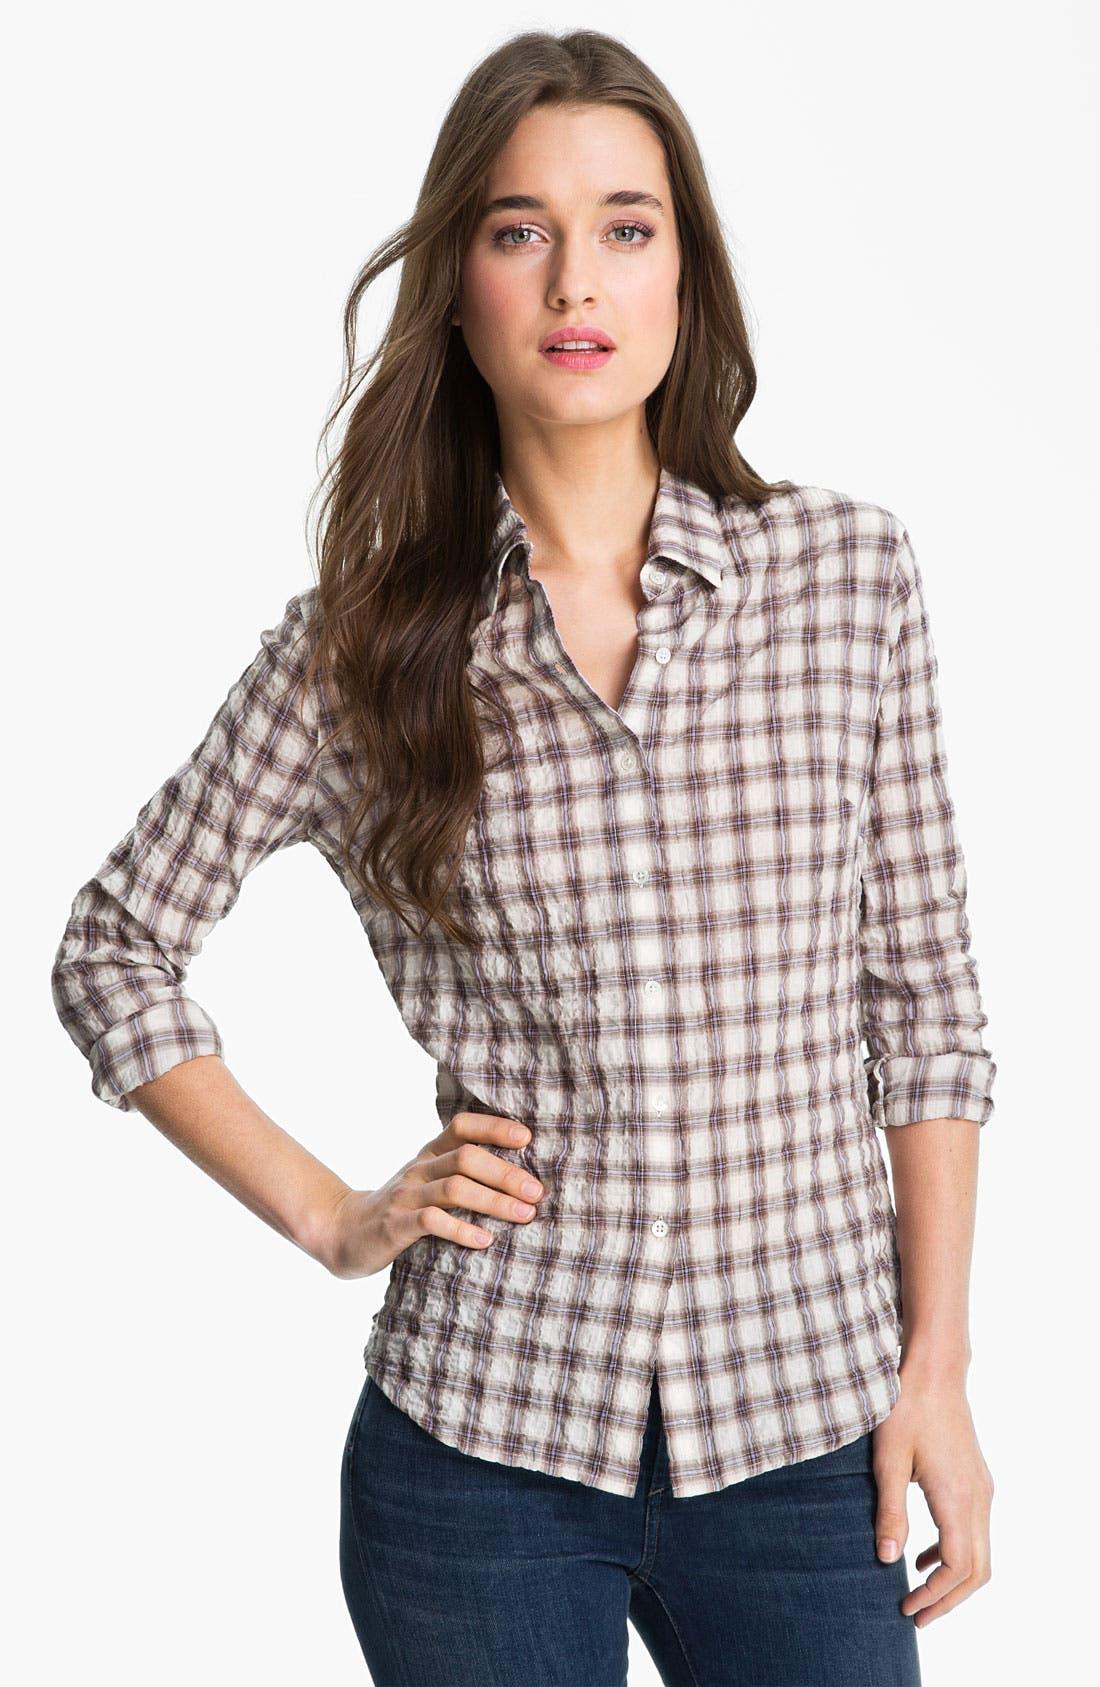 Alternate Image 1 Selected - James Perse 'Tomboy' Plaid Crinkle Shirt